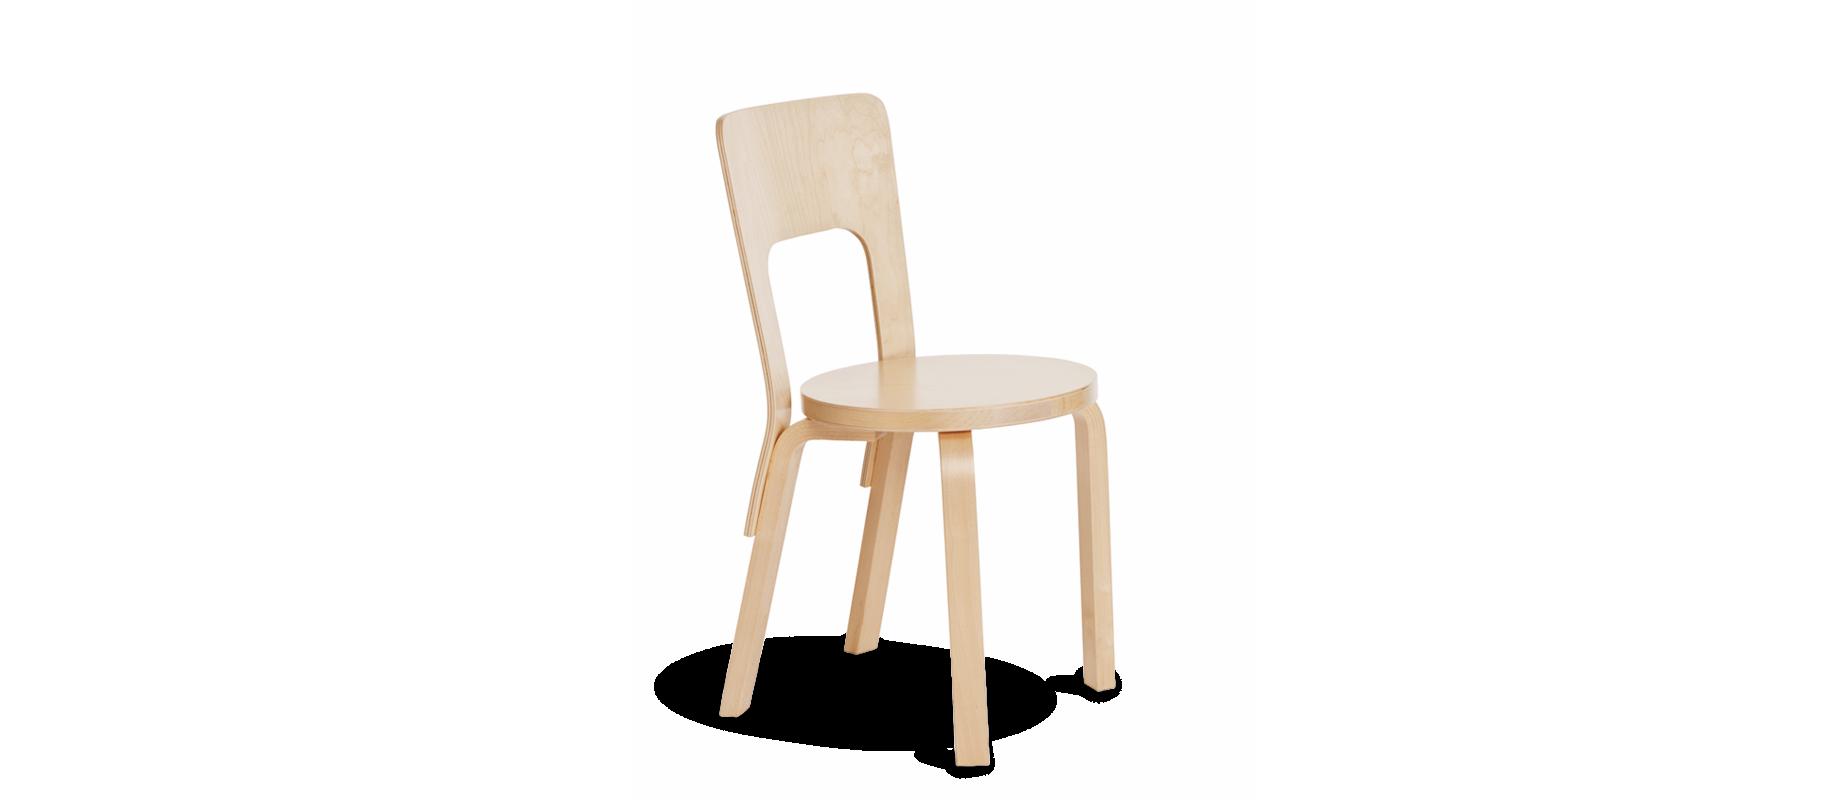 Pin by Isak Utegård on frjgtn Chair, Furniture, Home decor